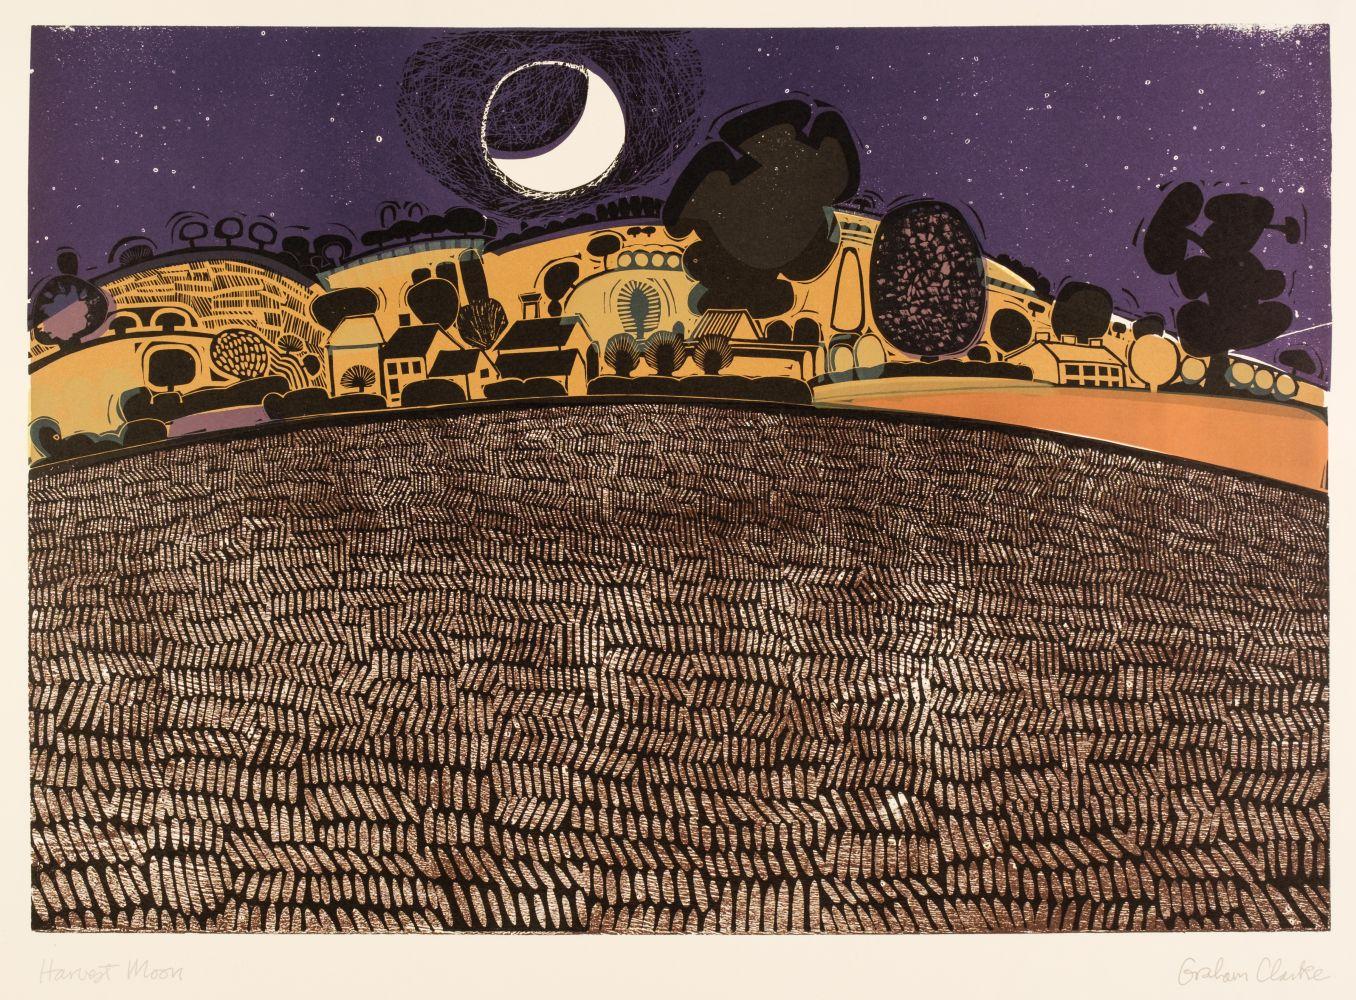 ARR * § Clarke (Graham, 1941-). Harvest Moon, circa 1966